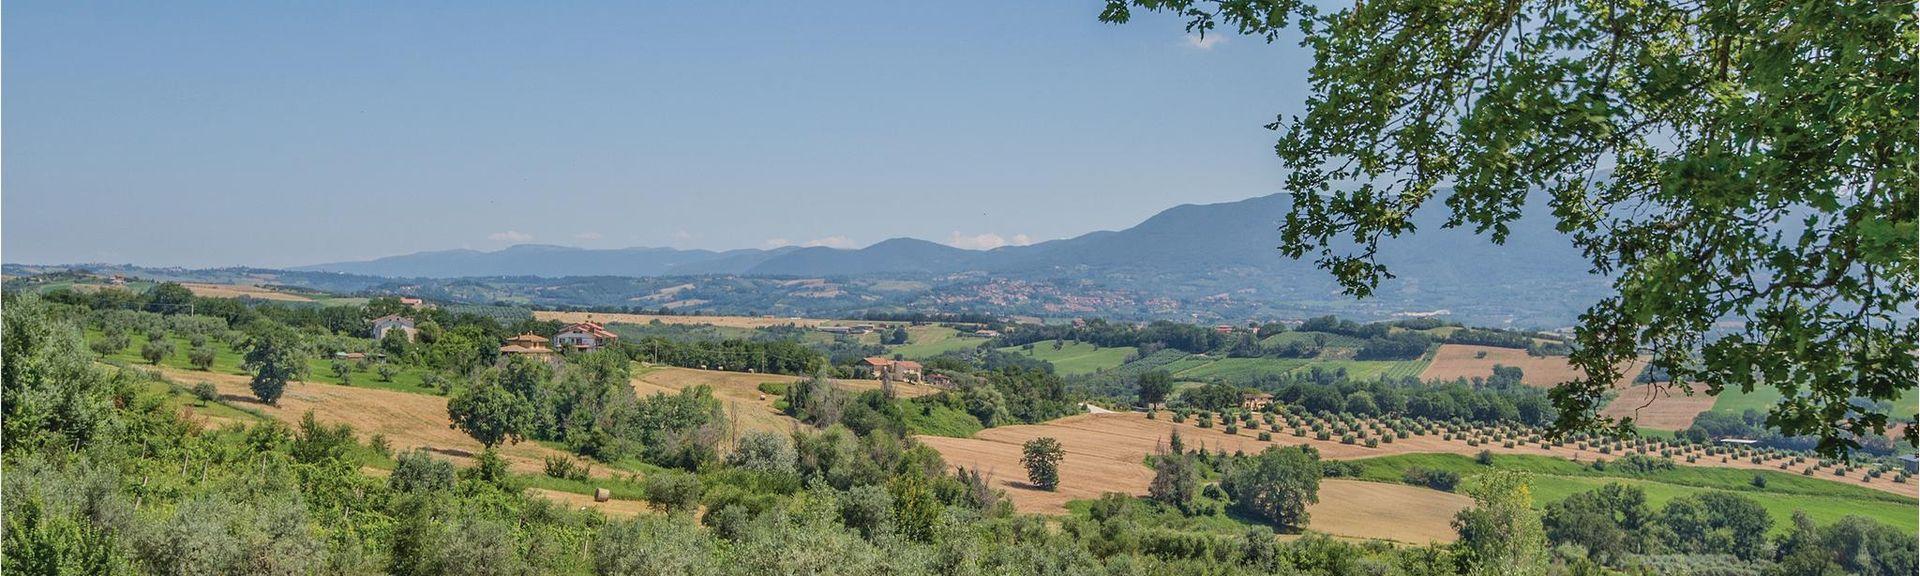 Calvi dell'Umbria, Terni, Italy